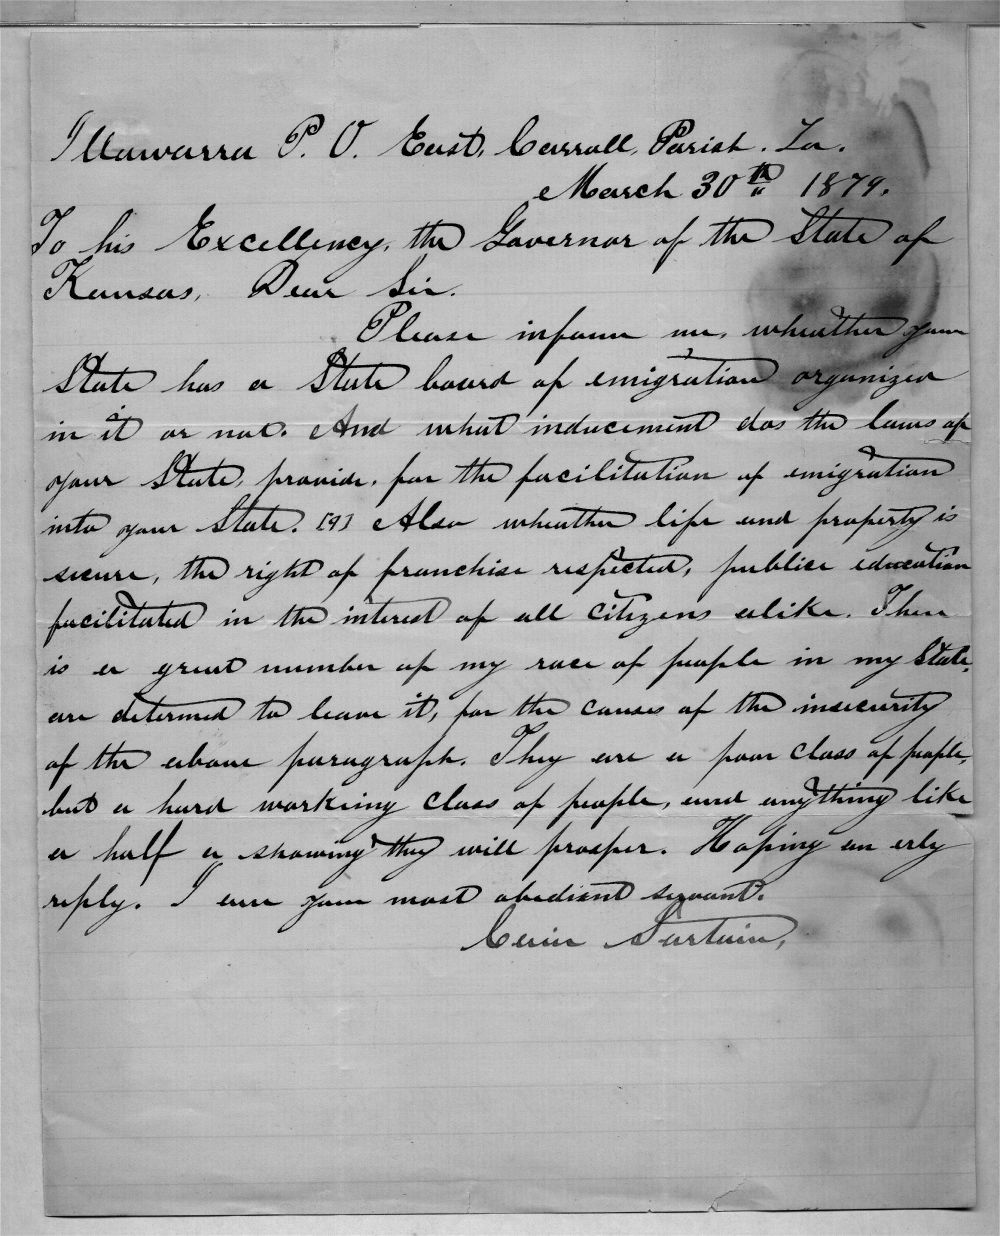 Governor John St. John, Exoduster received correspondence - 1 (April 1879)